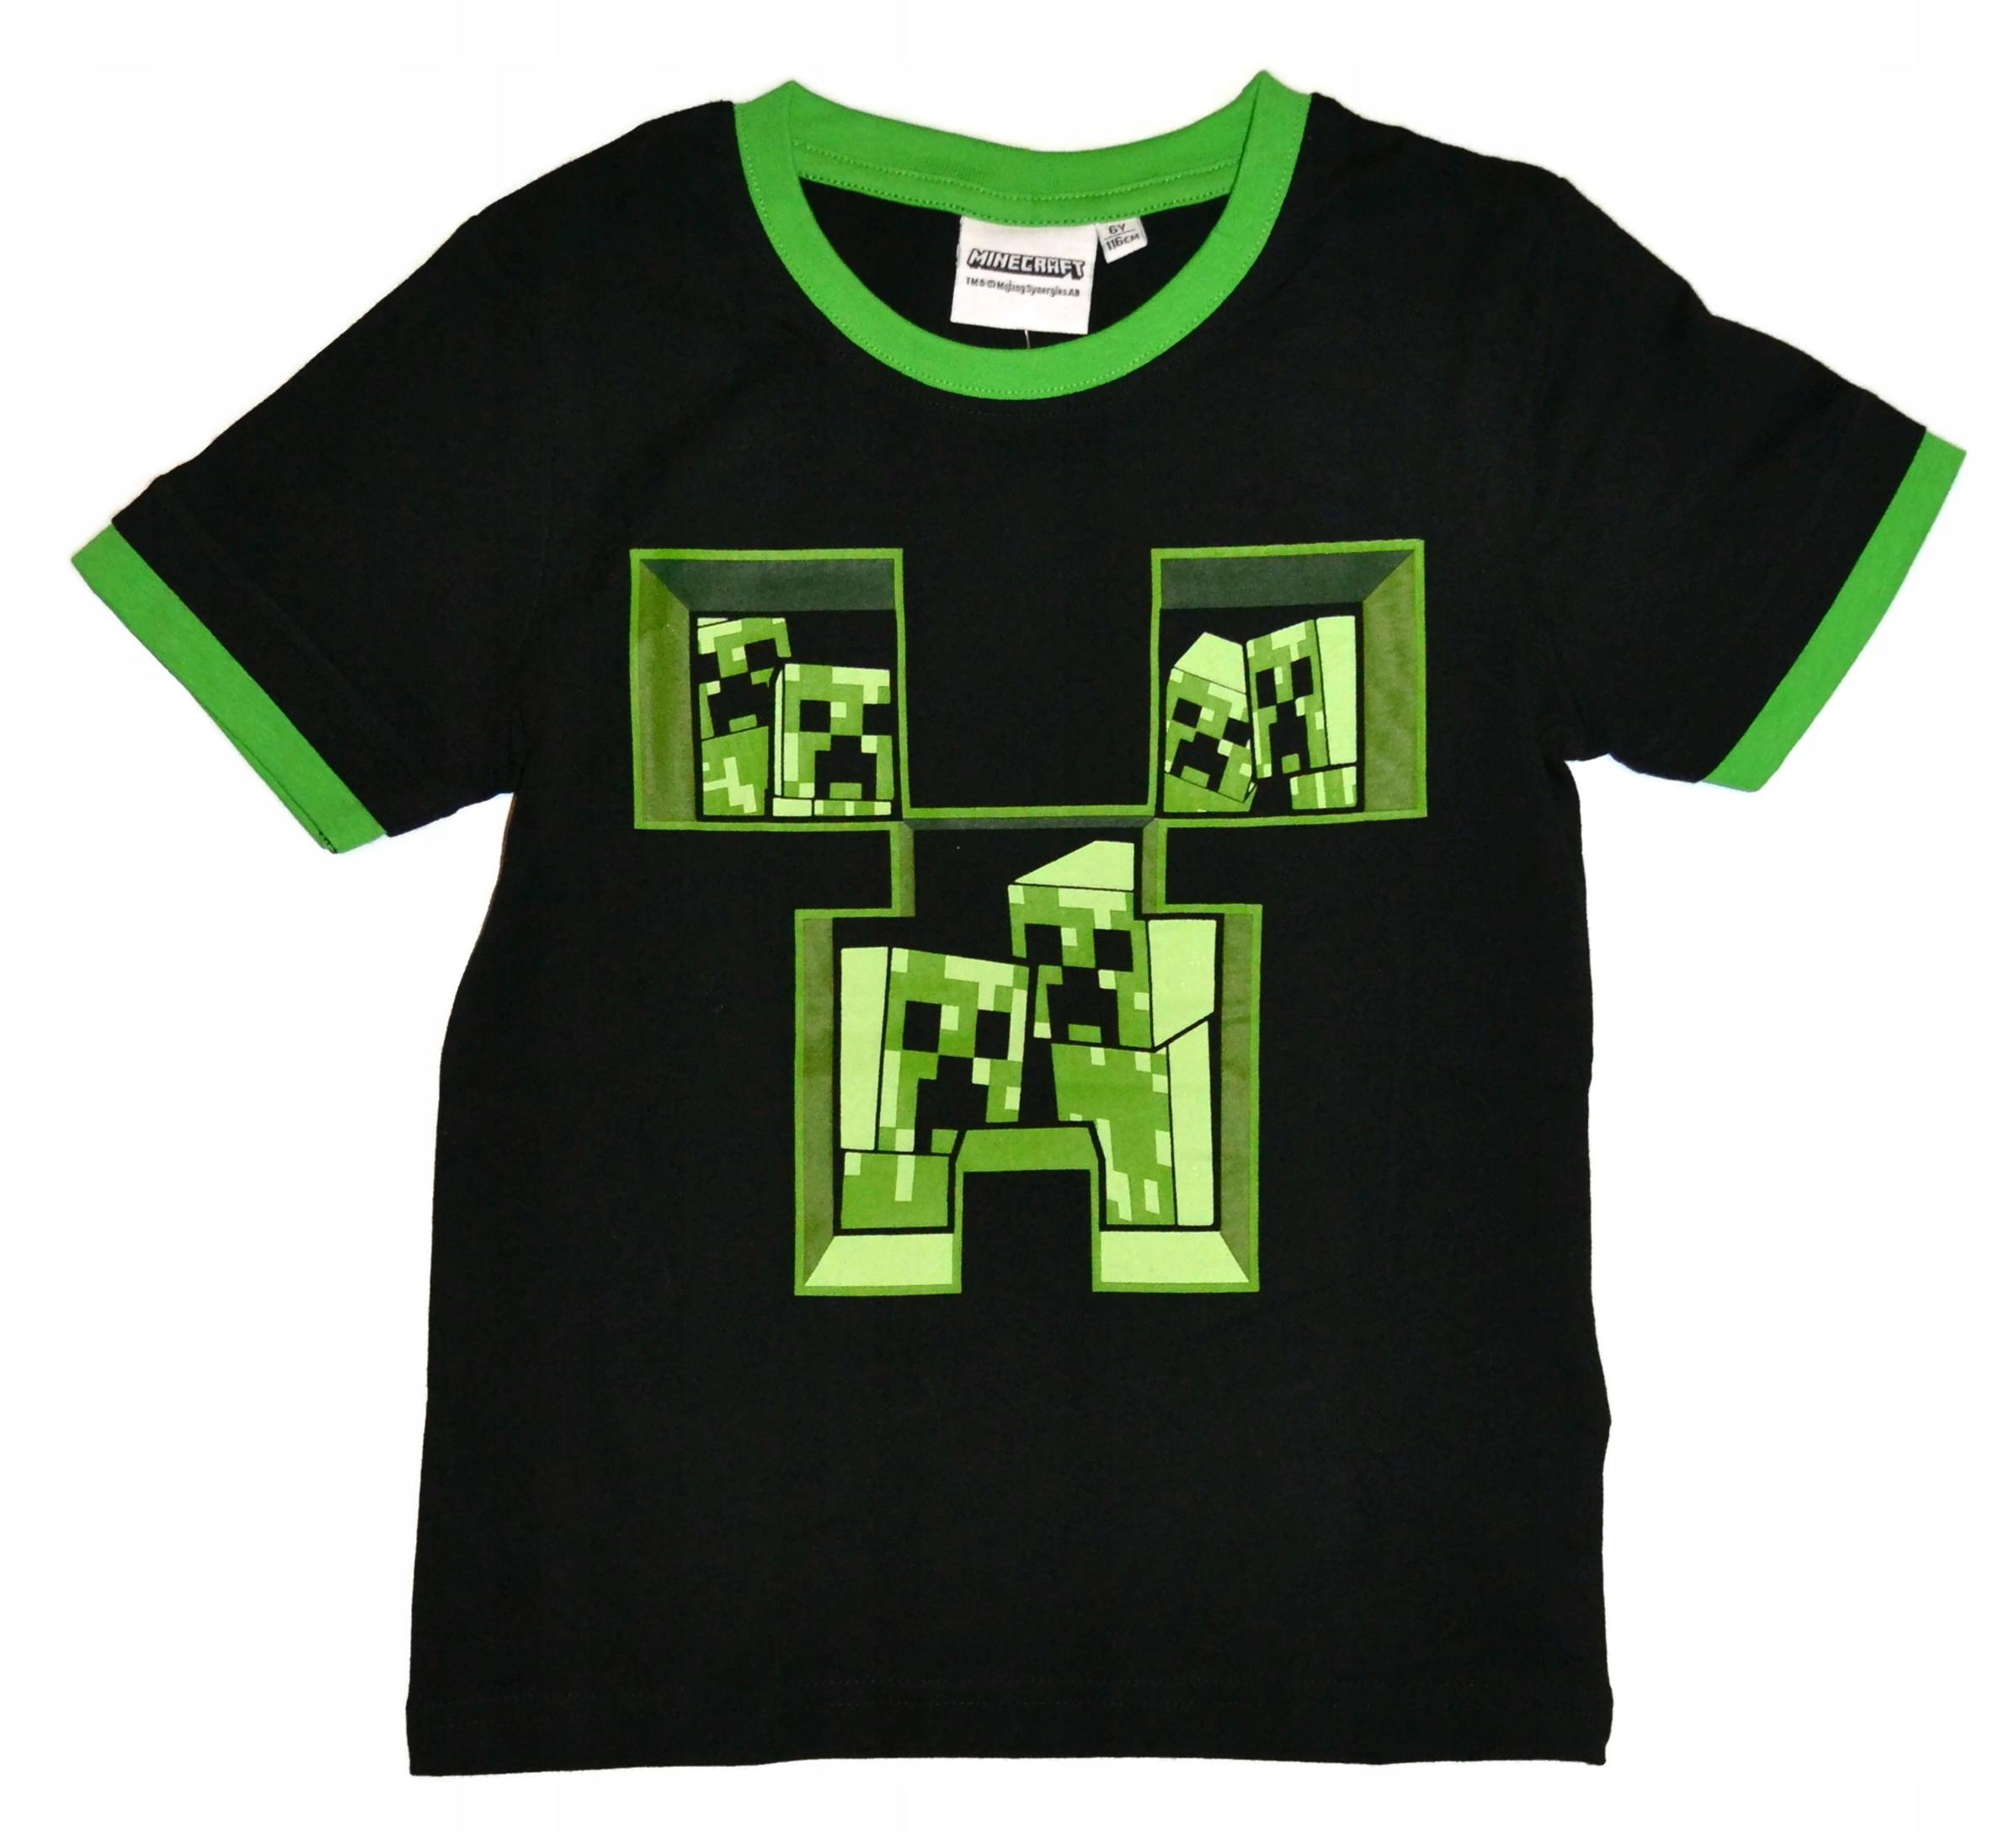 MINECRAFT 152, blúzky, blúzky, t-shirt